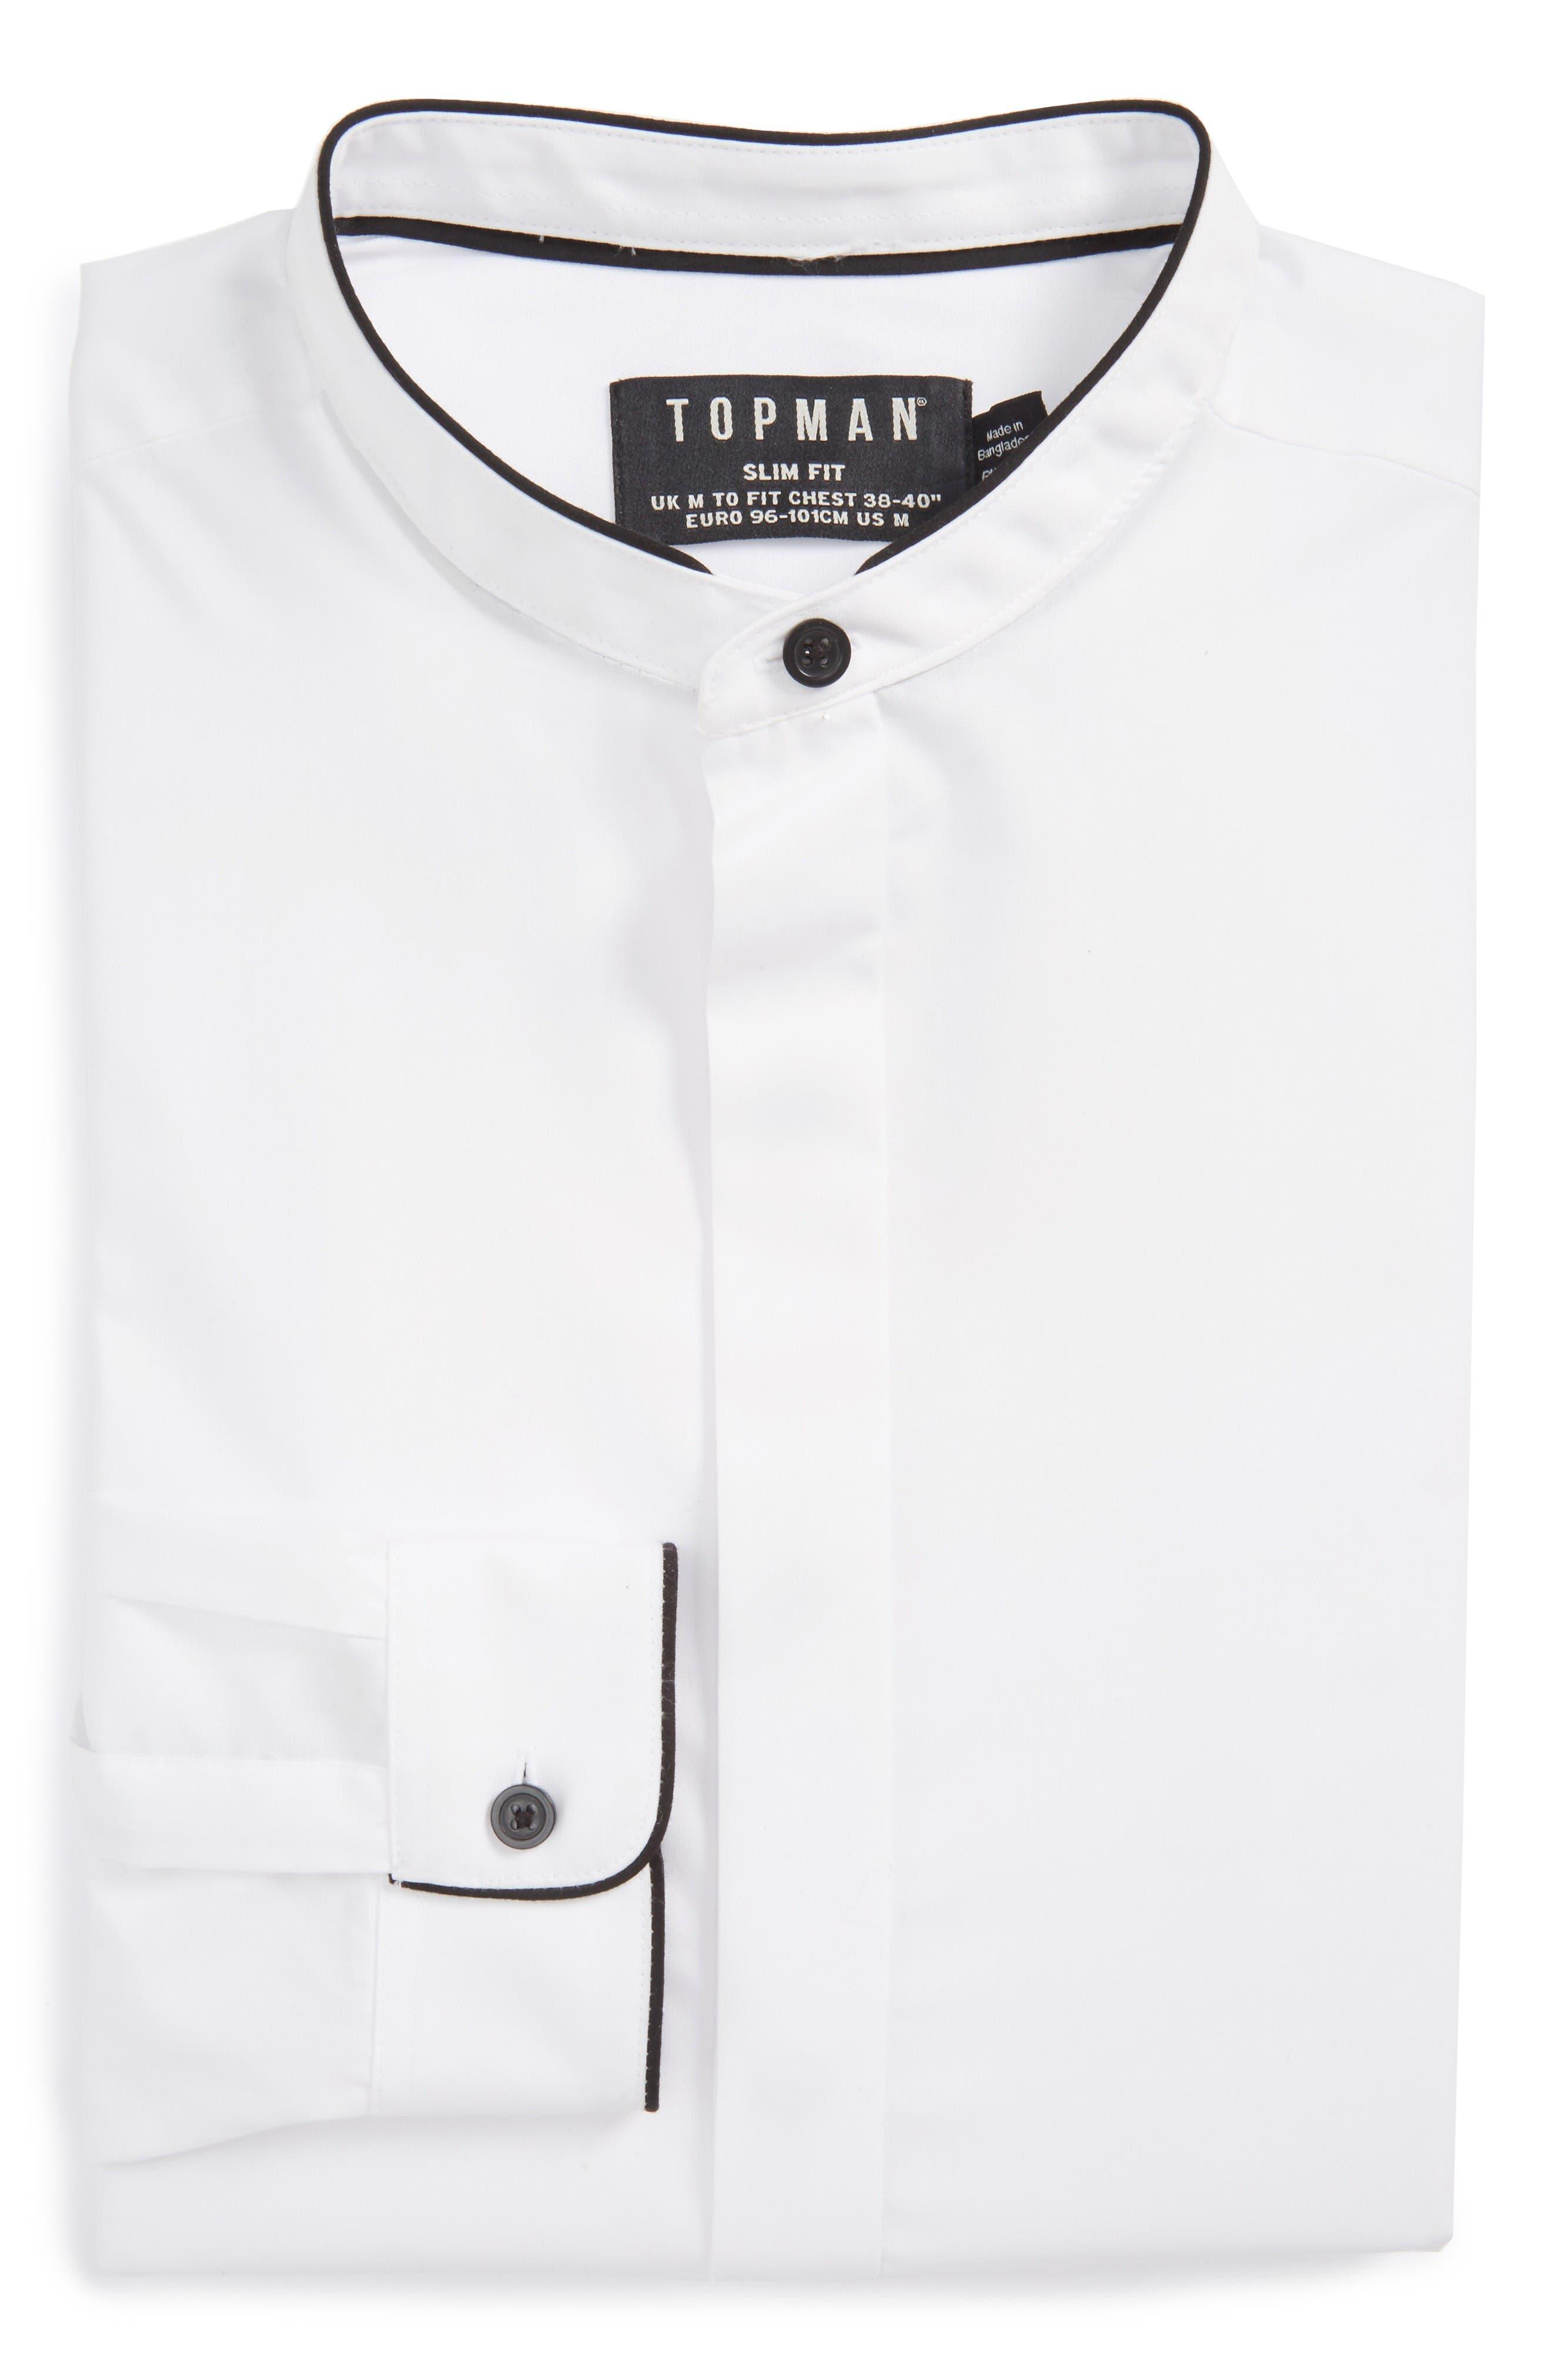 Main Image - Topman Slim Fit Band Collar Dress Shirt